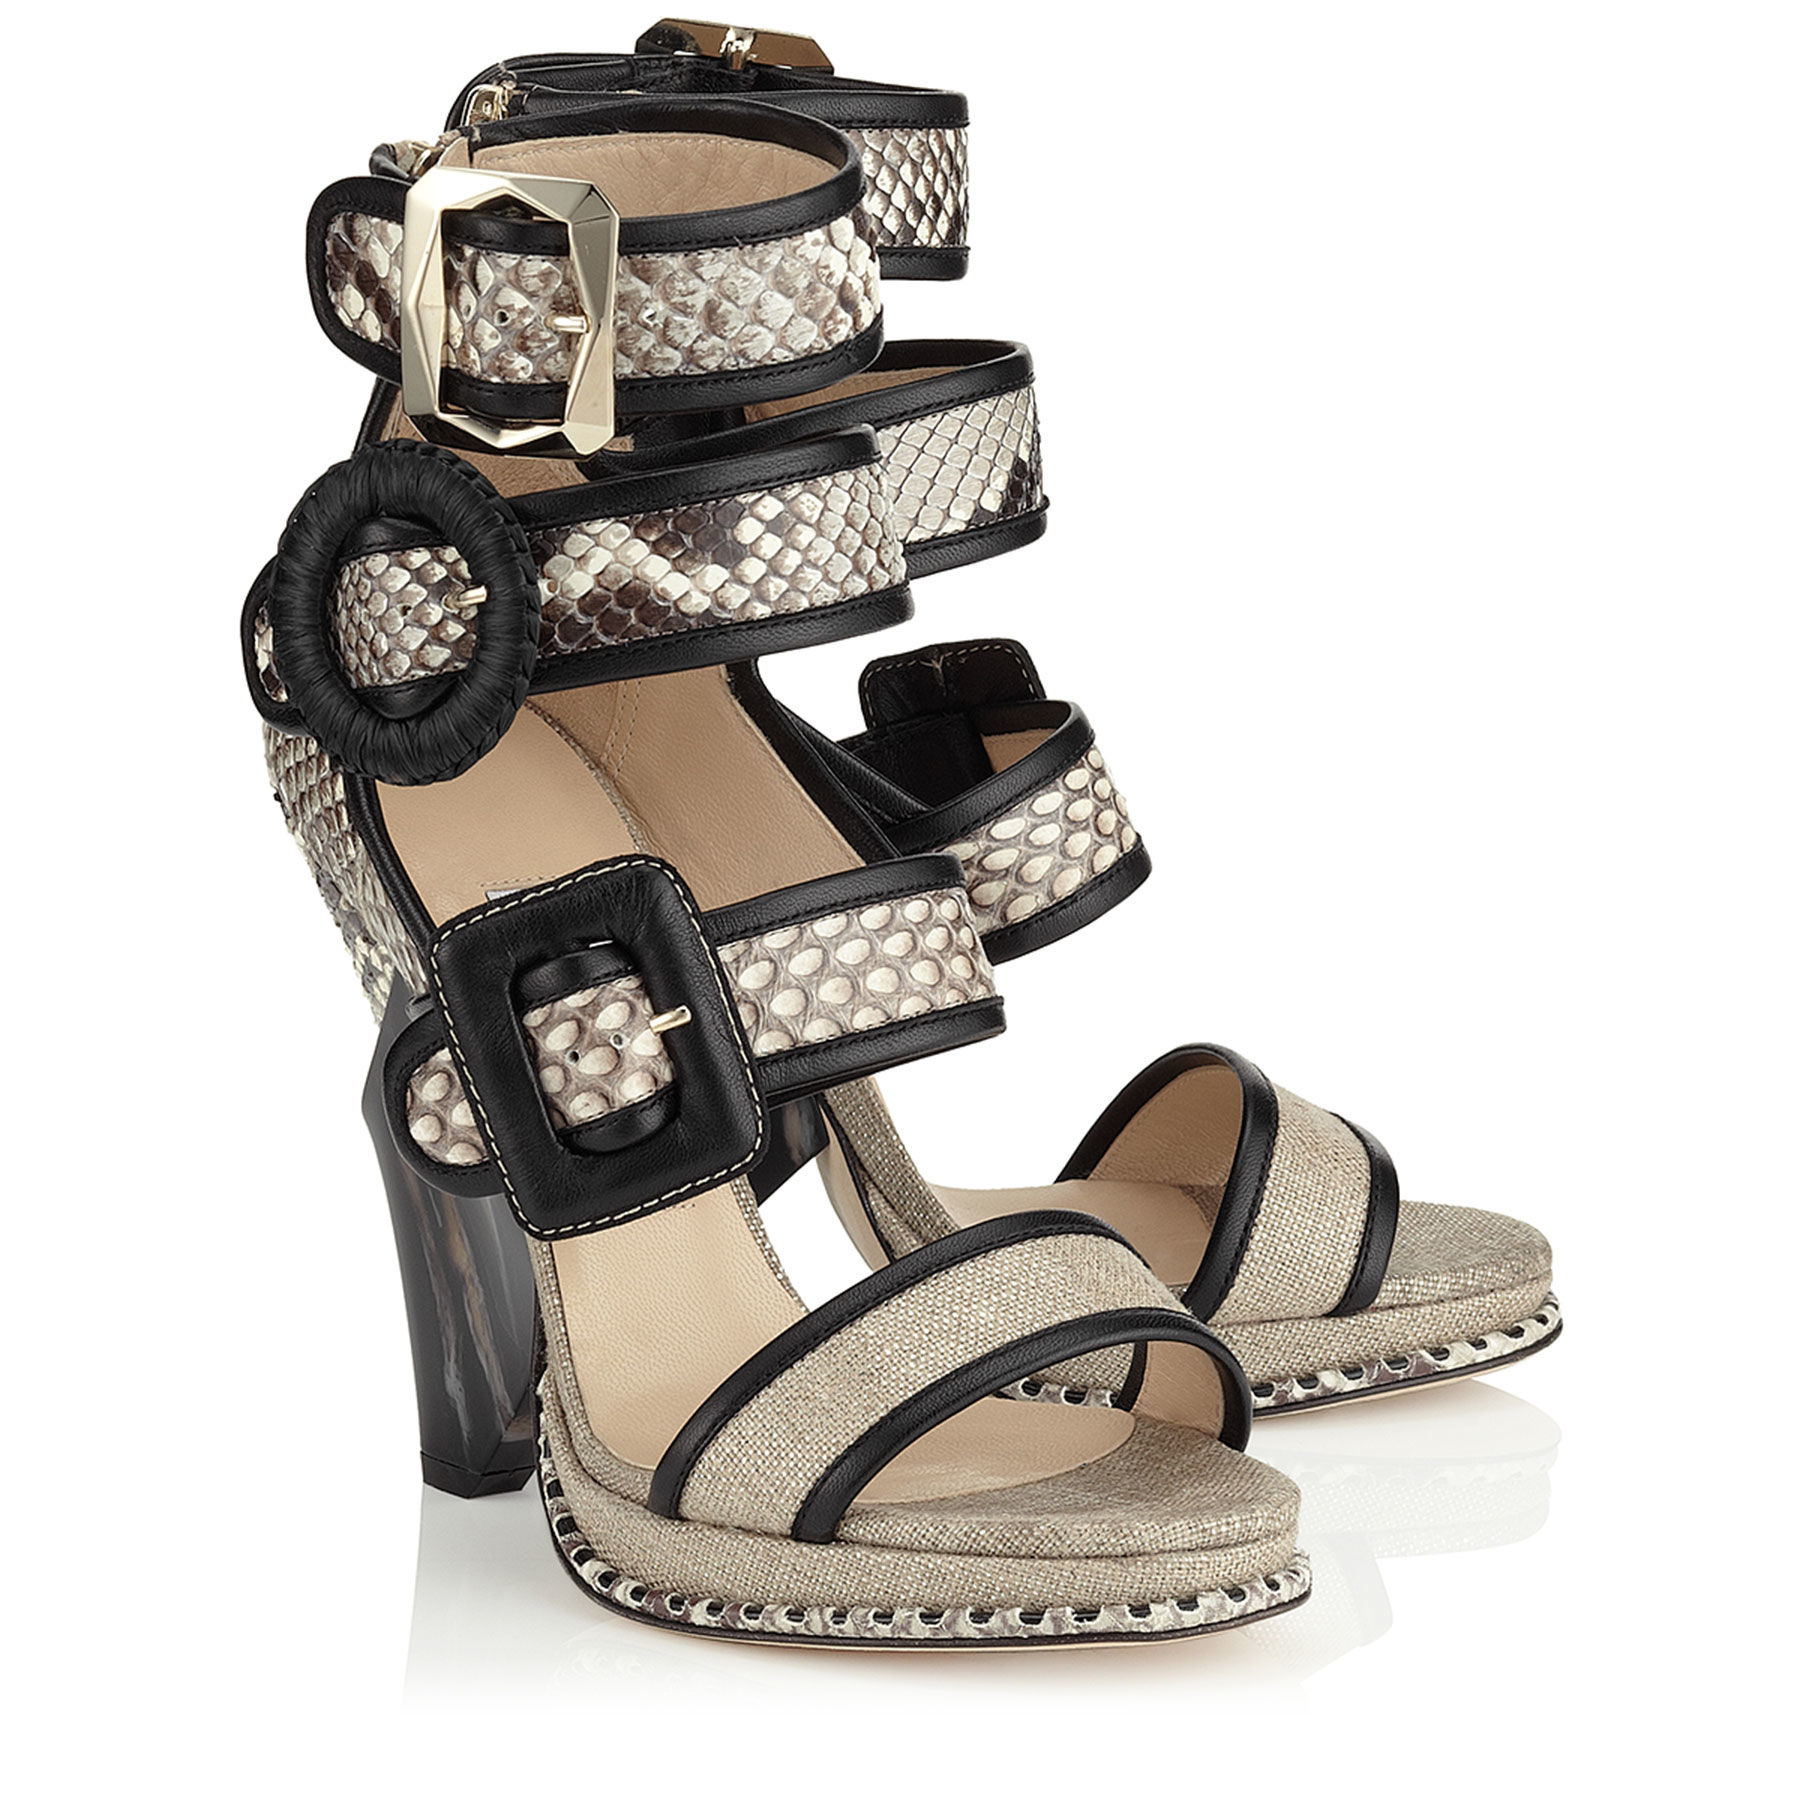 Kaya Brand Shoes